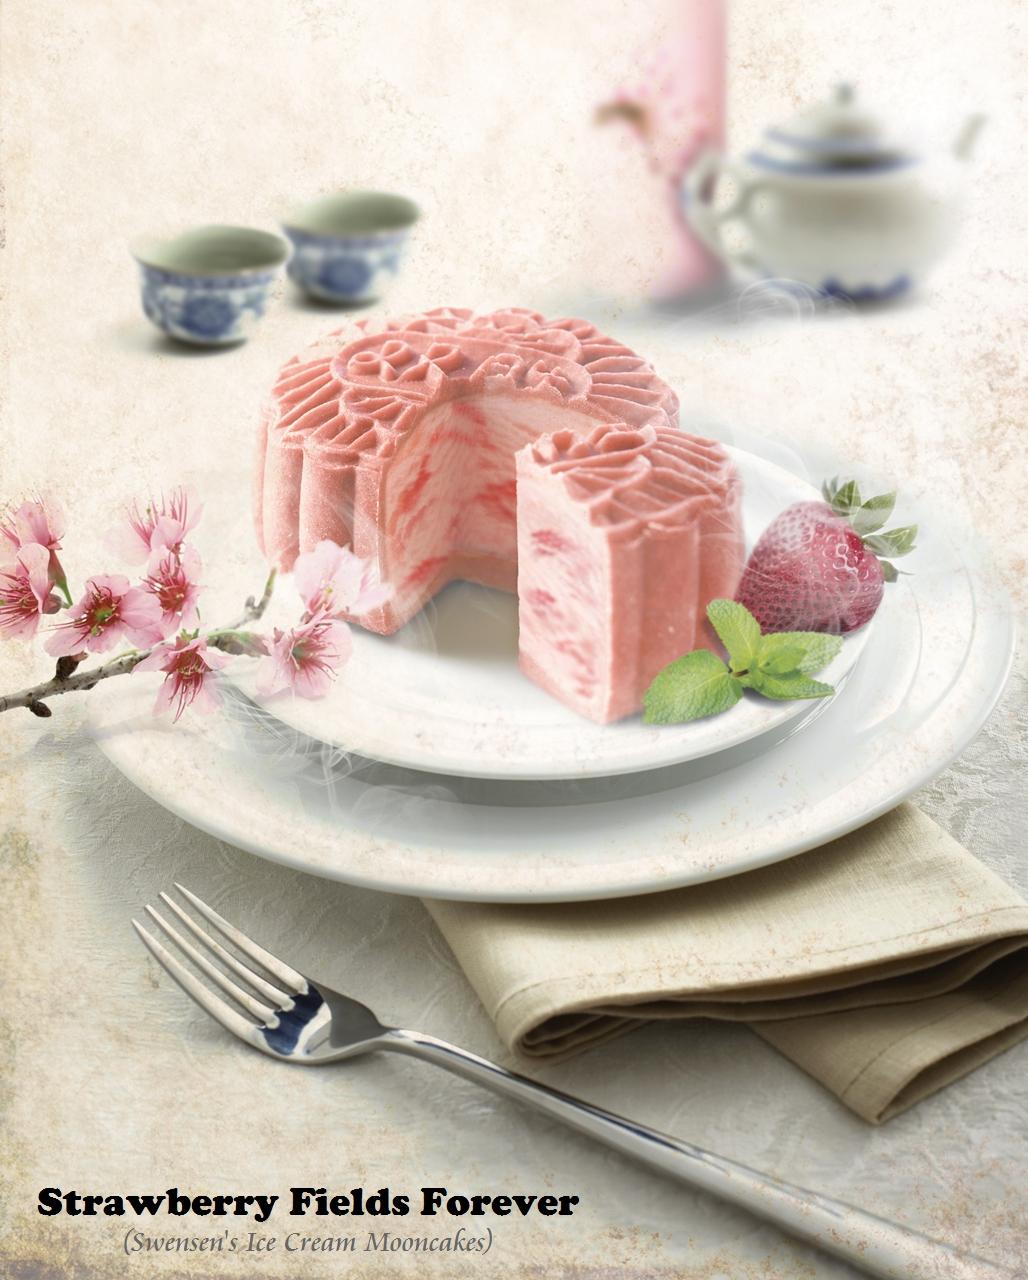 Cake Ice Cream Swensen S : Cuisine Paradise Eat, Shop And Travel: Mid Autumn At ...